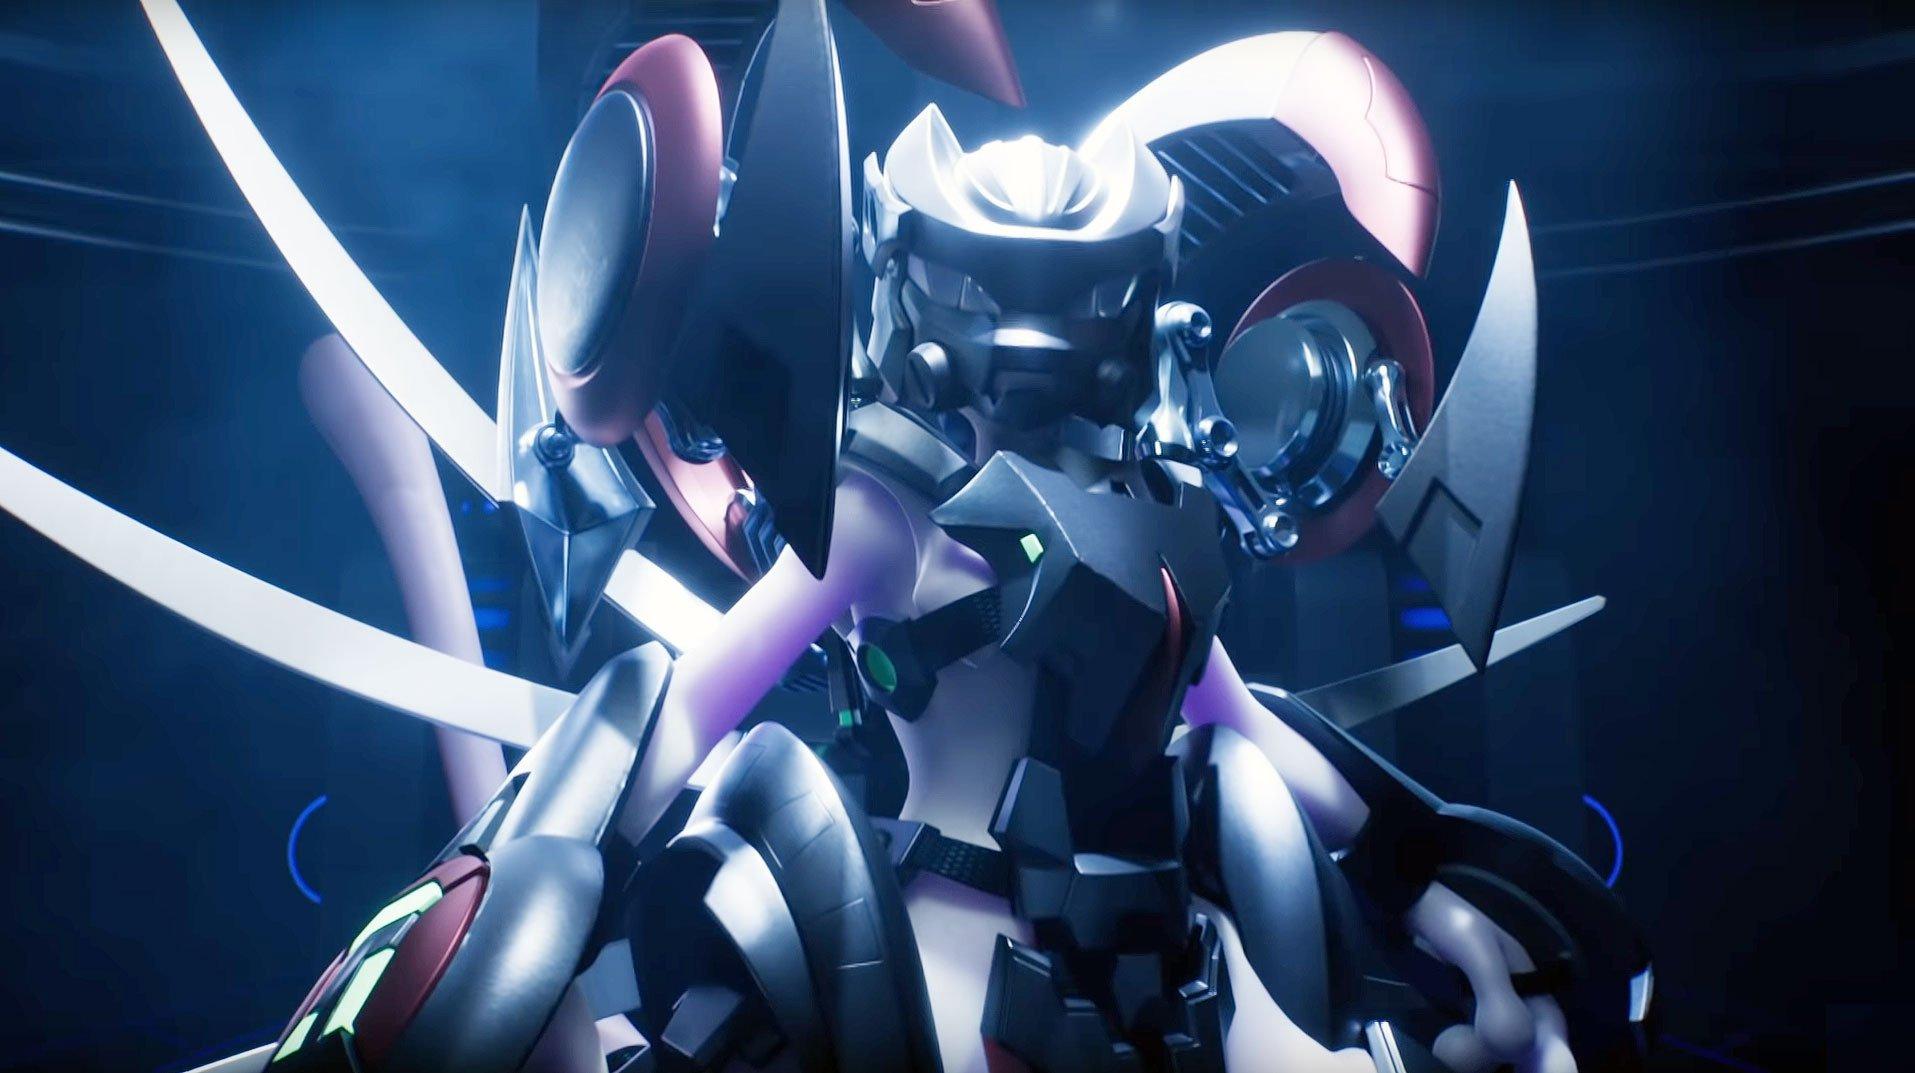 armored-mewtwo.jpg